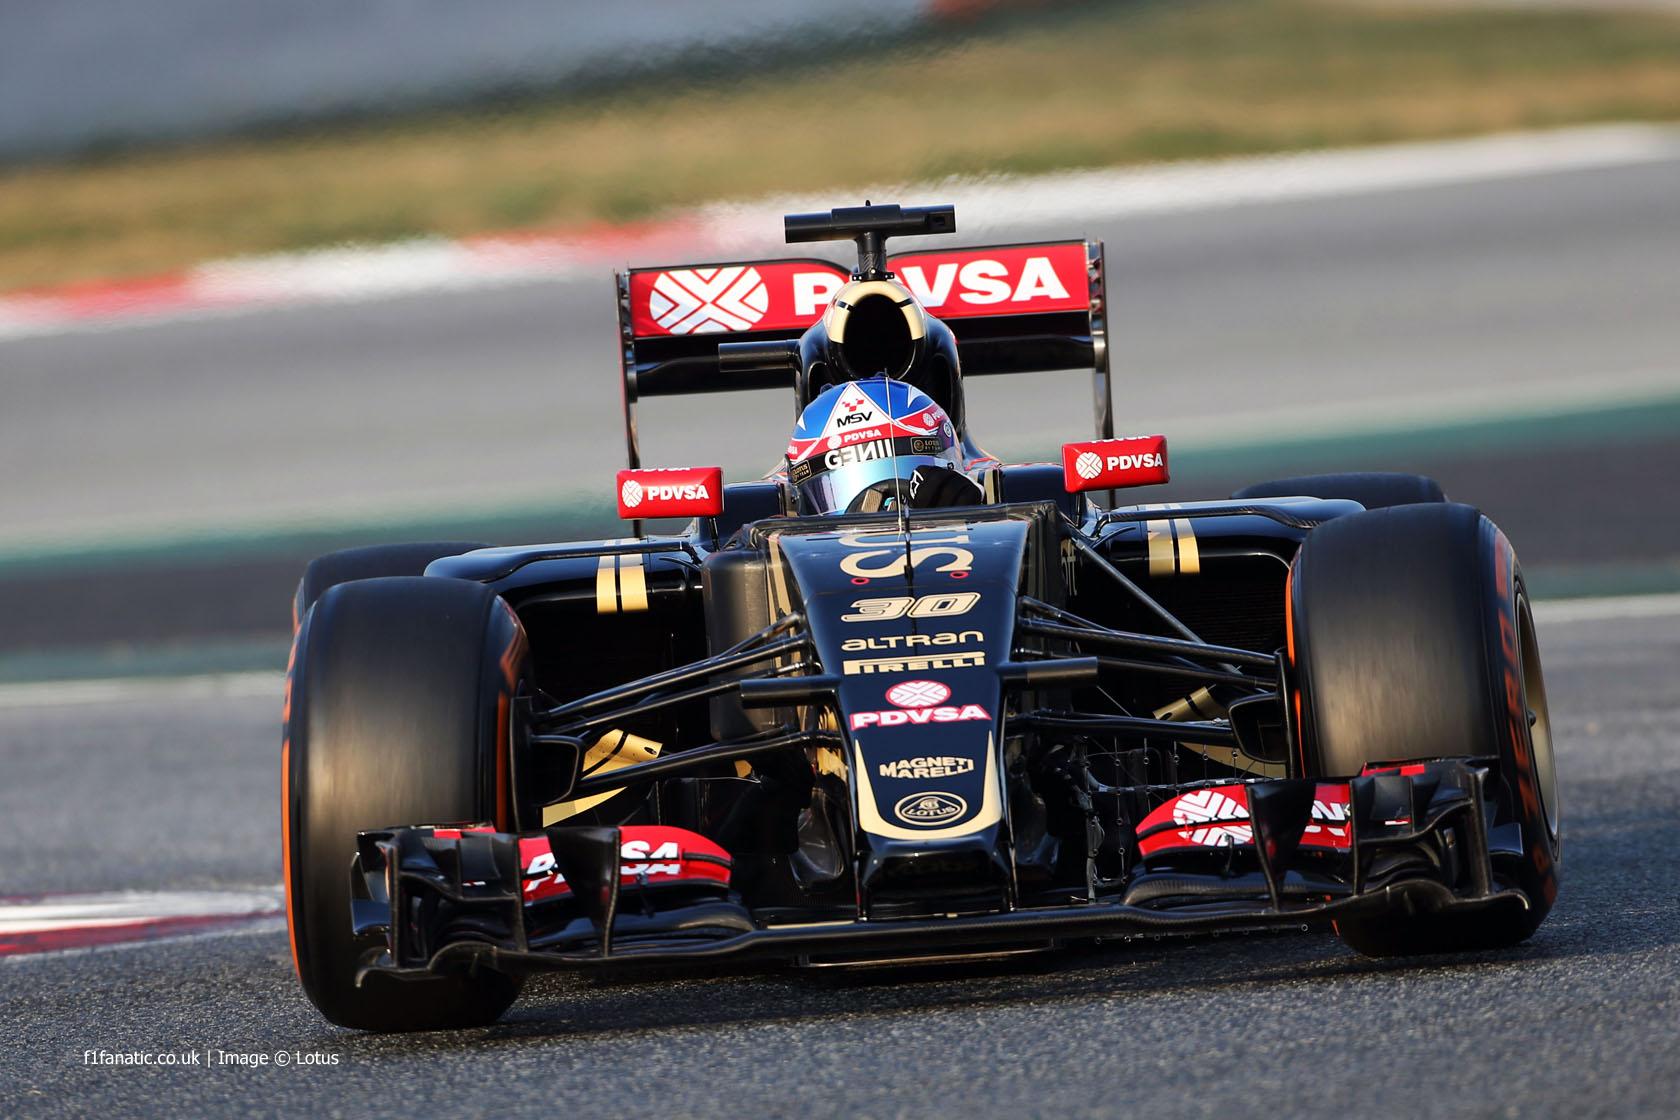 Jolyon Palmer, Lotus, Circuit de Catalunya, 2015